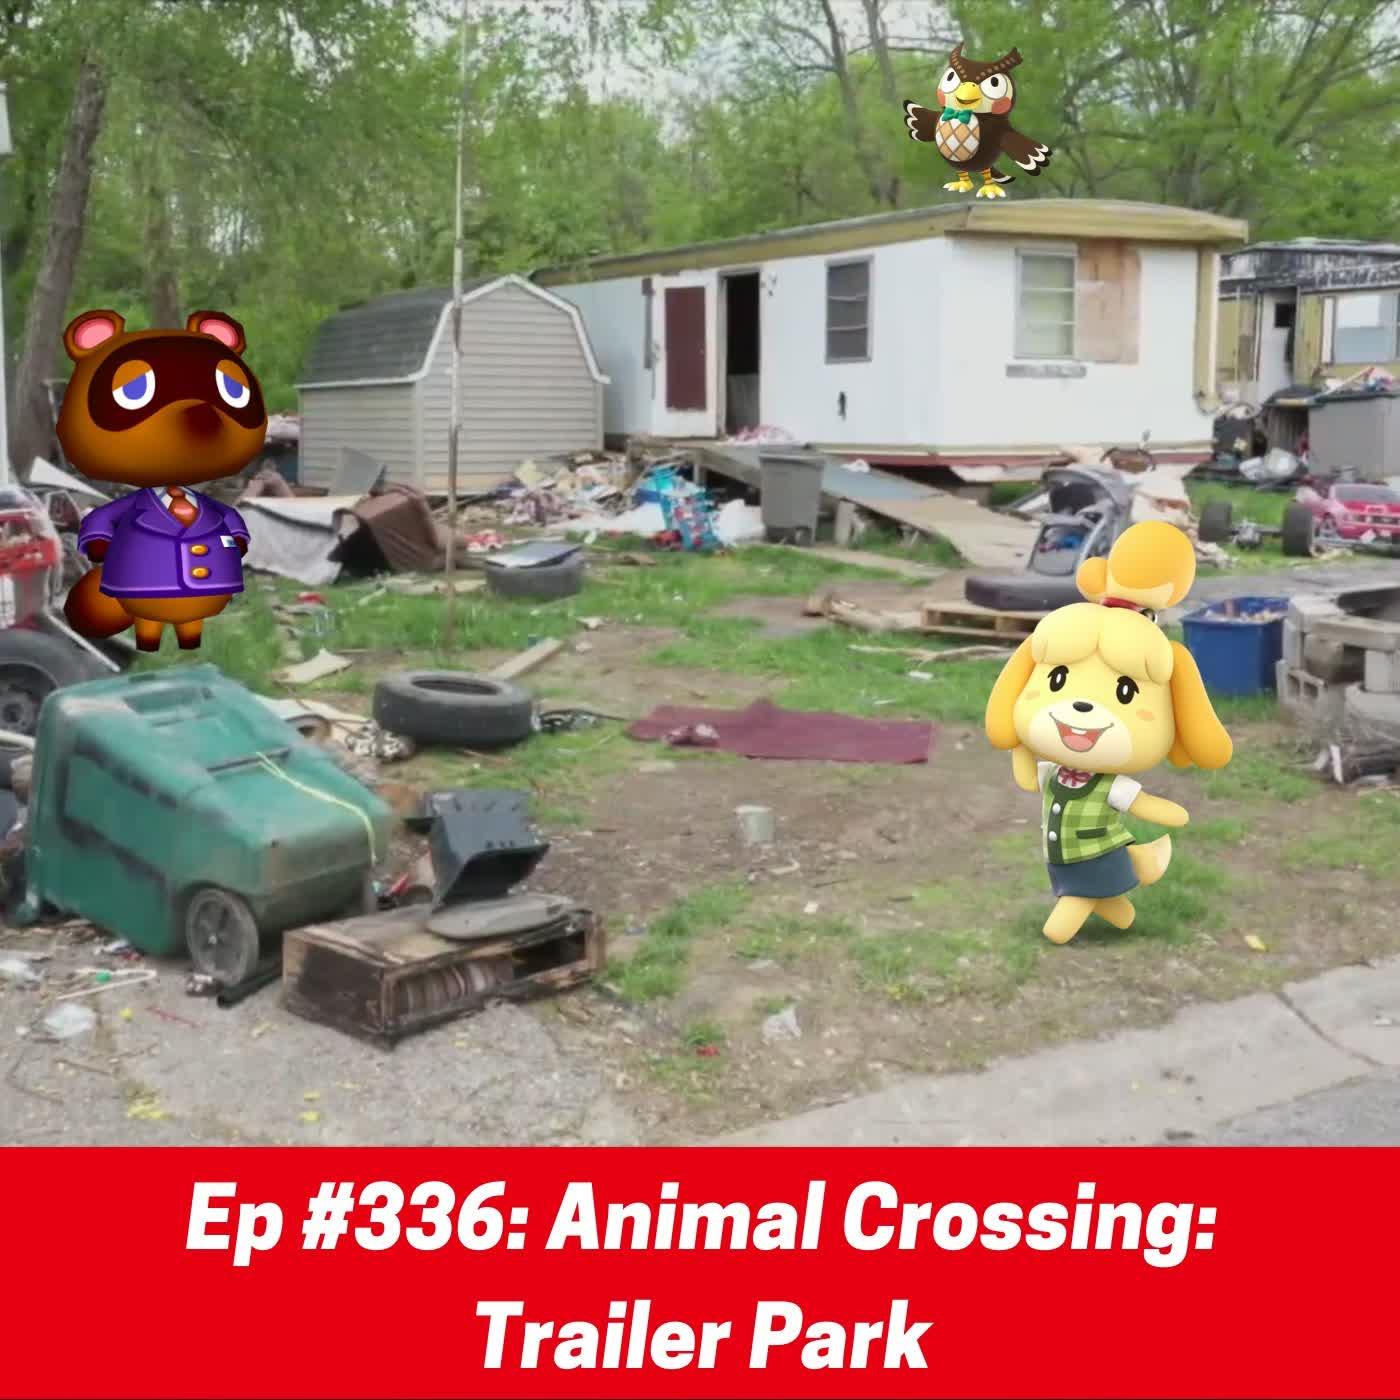 #336: Animal Crossing: Trailer Park